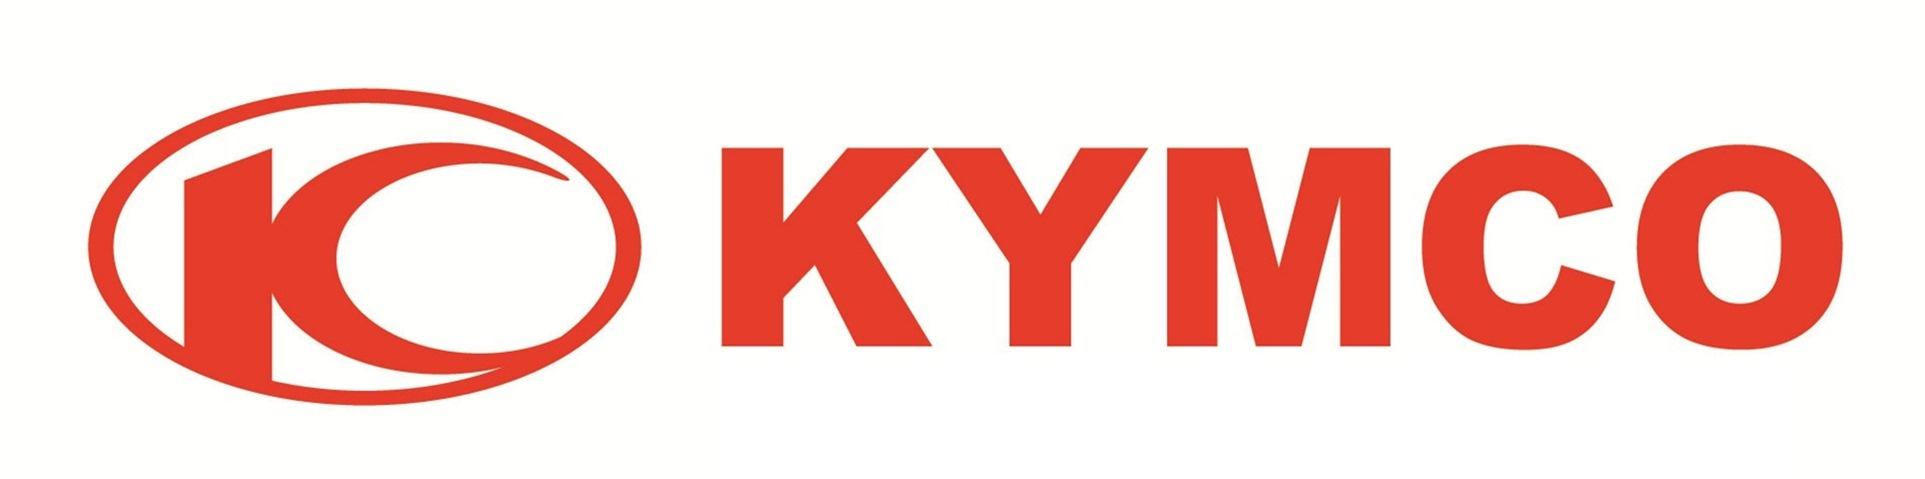 KYMCO logo_PMS 485